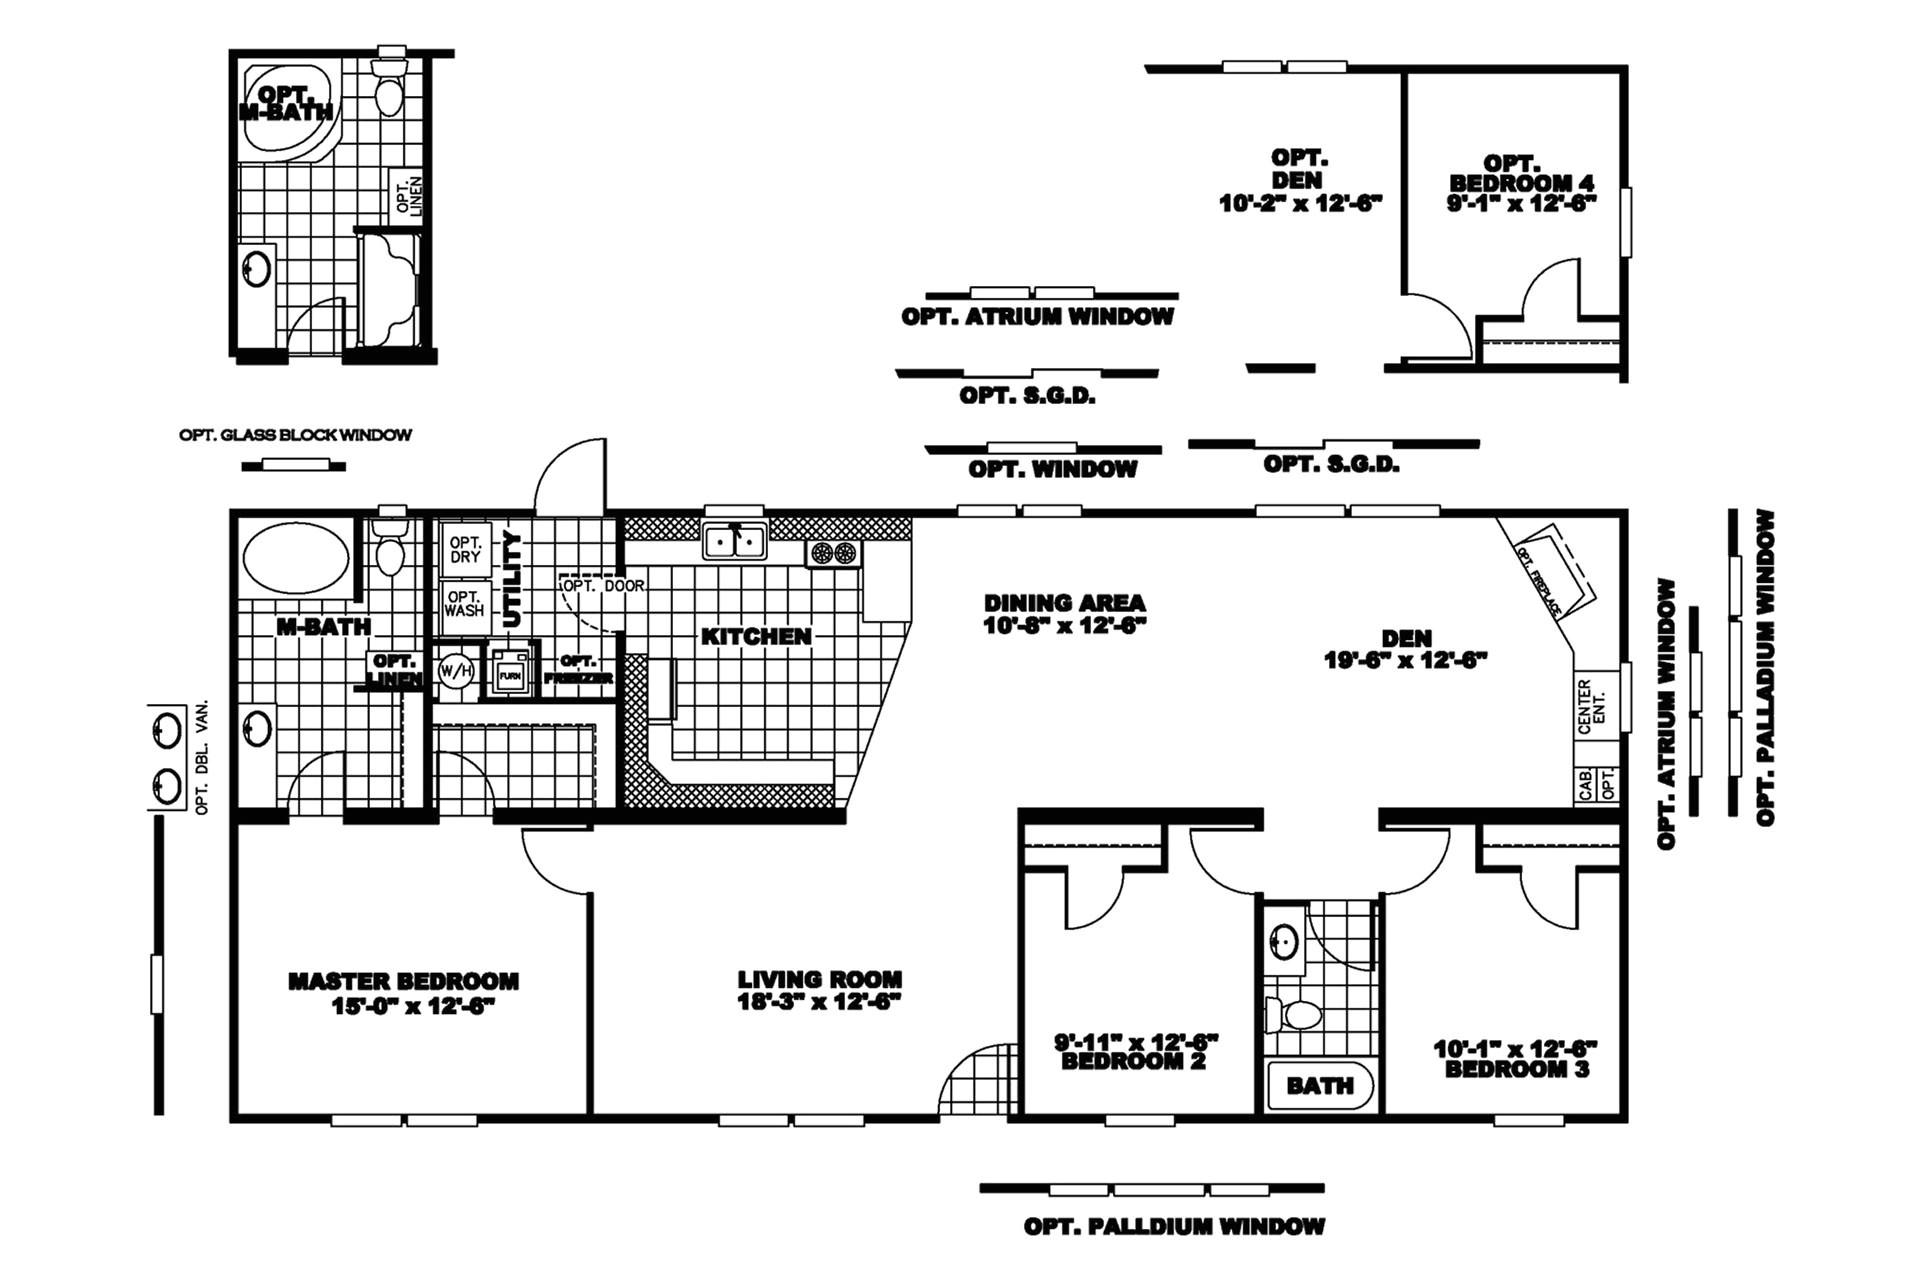 manufacturedhomefloorplan floorplan 3844 state ok city stratford